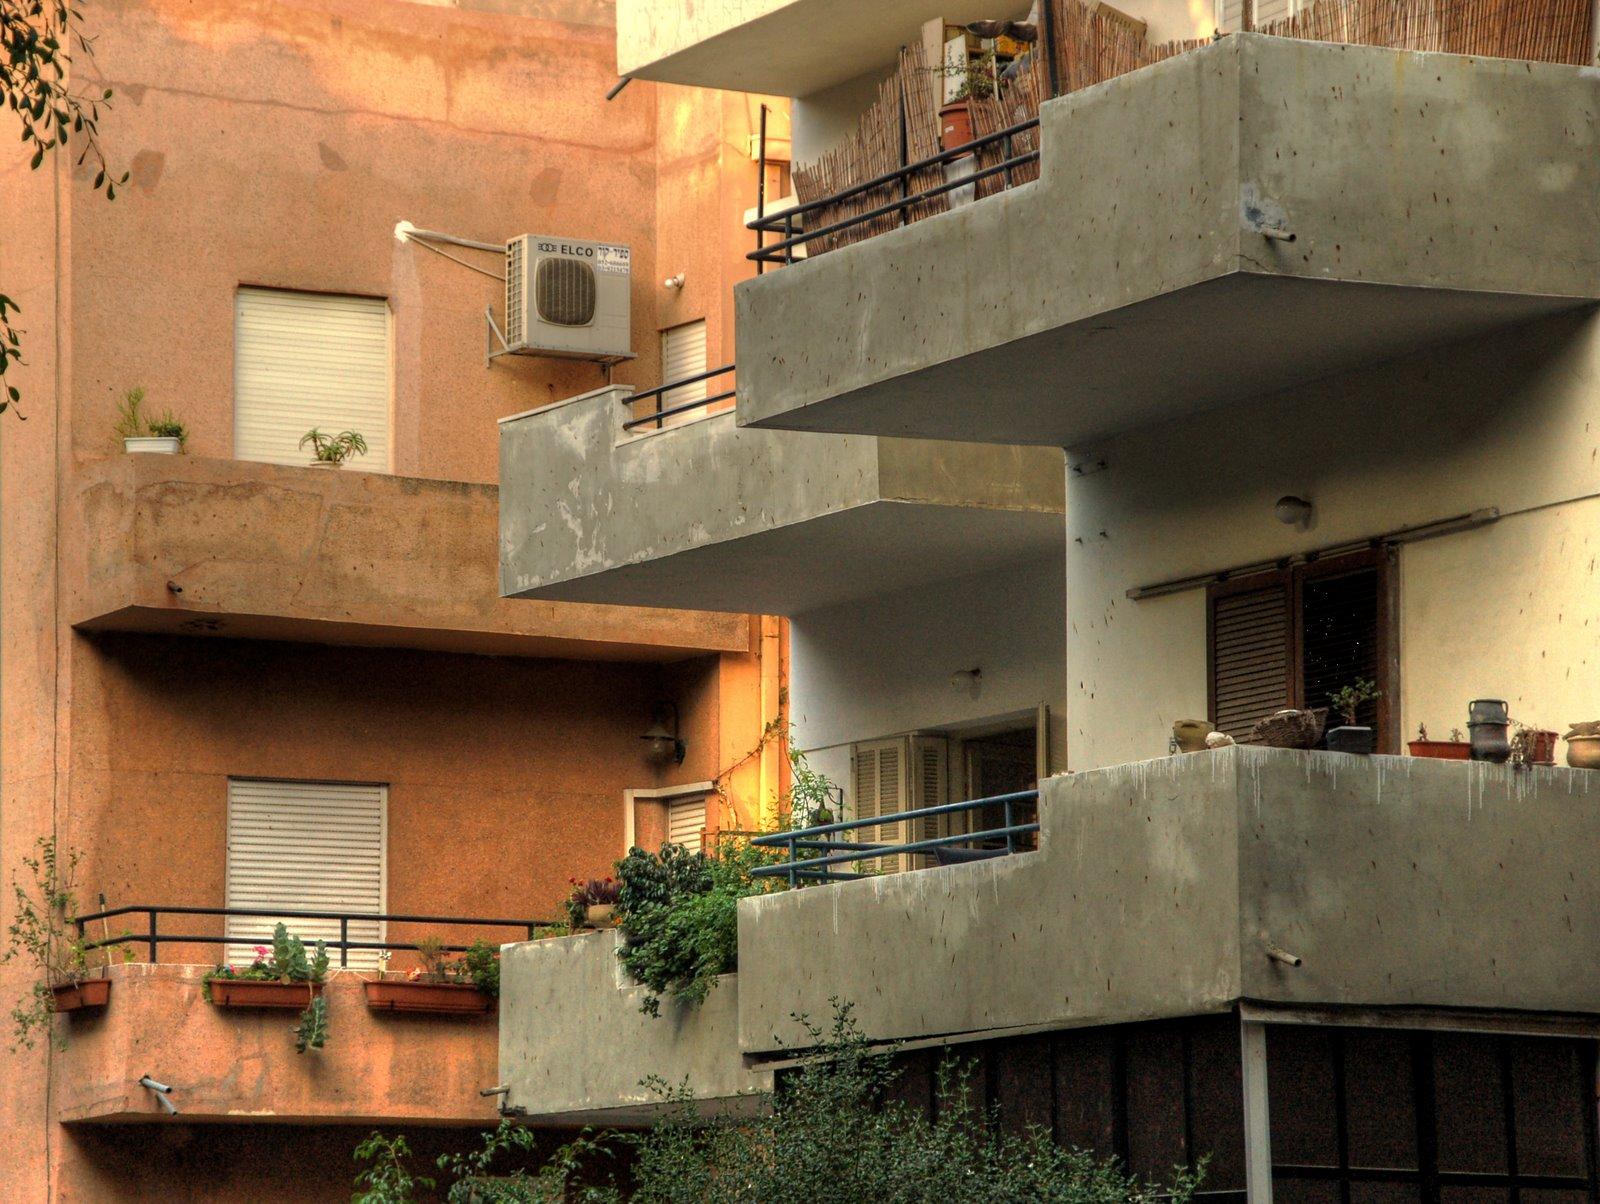 Tel aviv bauhaus architecture 03 blog for Architecture bauhaus